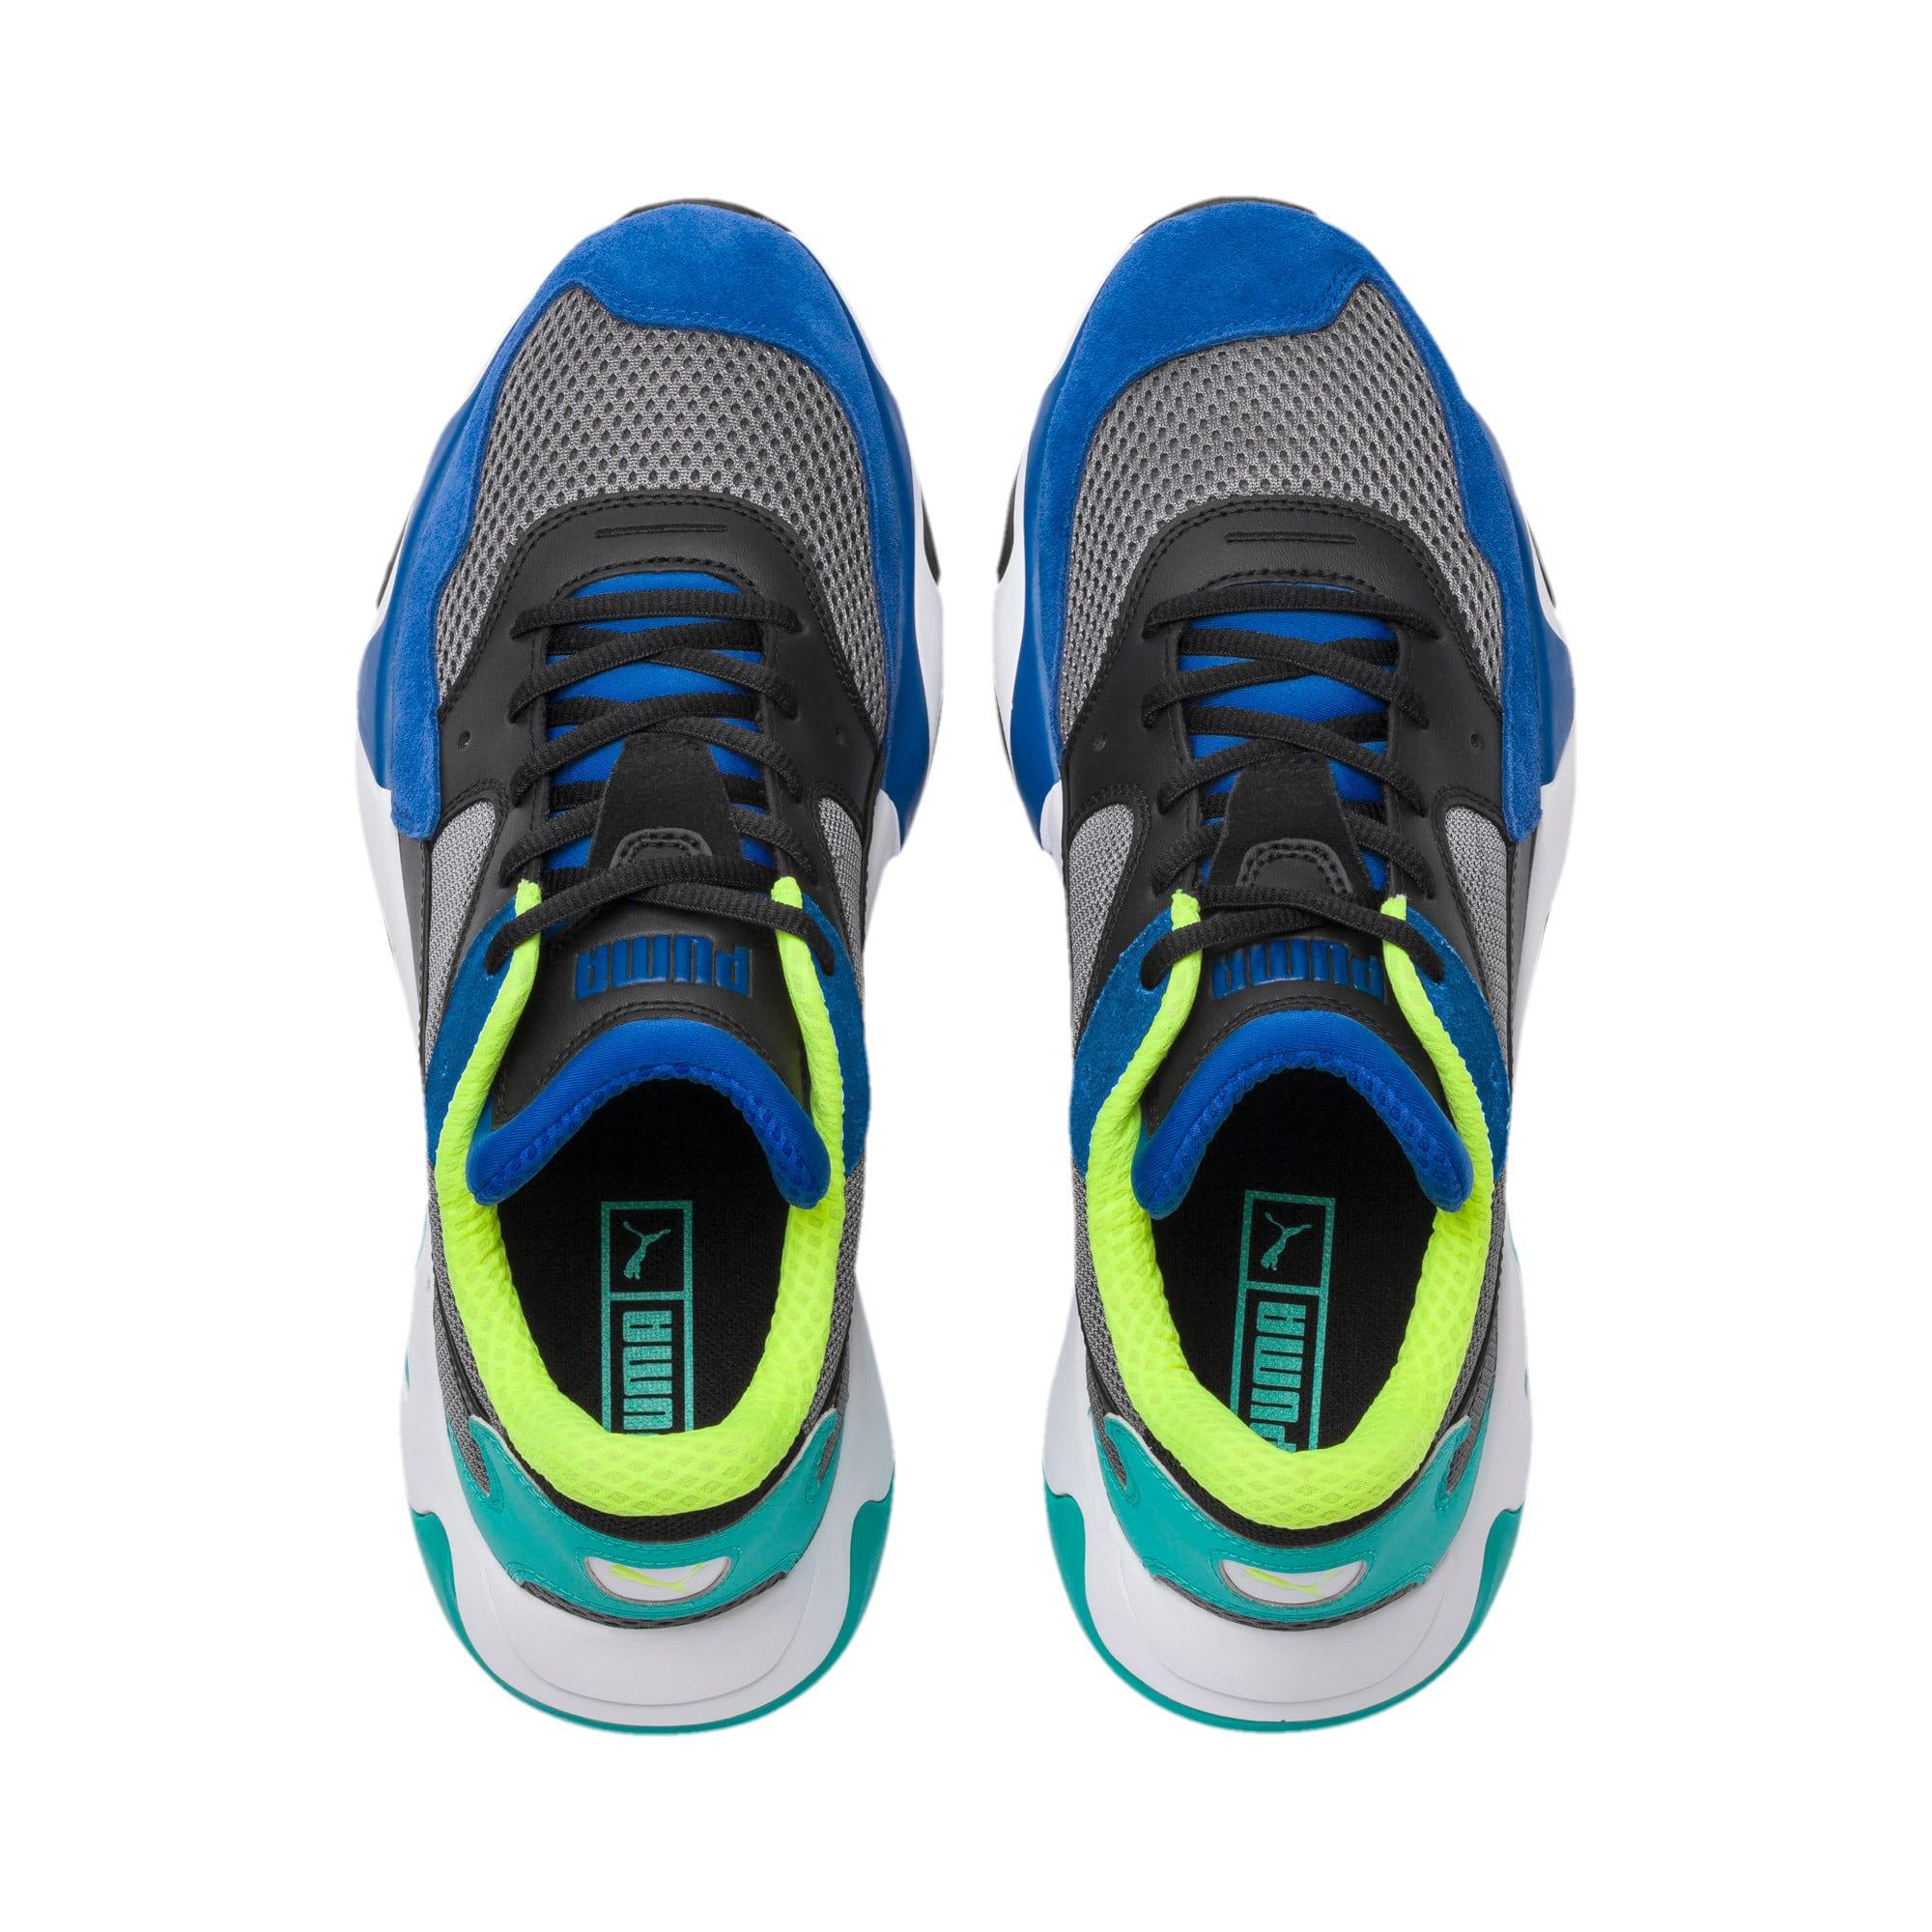 Thumbnail 7 of Storm Origin Sneaker, Galaxy Blue-CASTLEROCK, medium